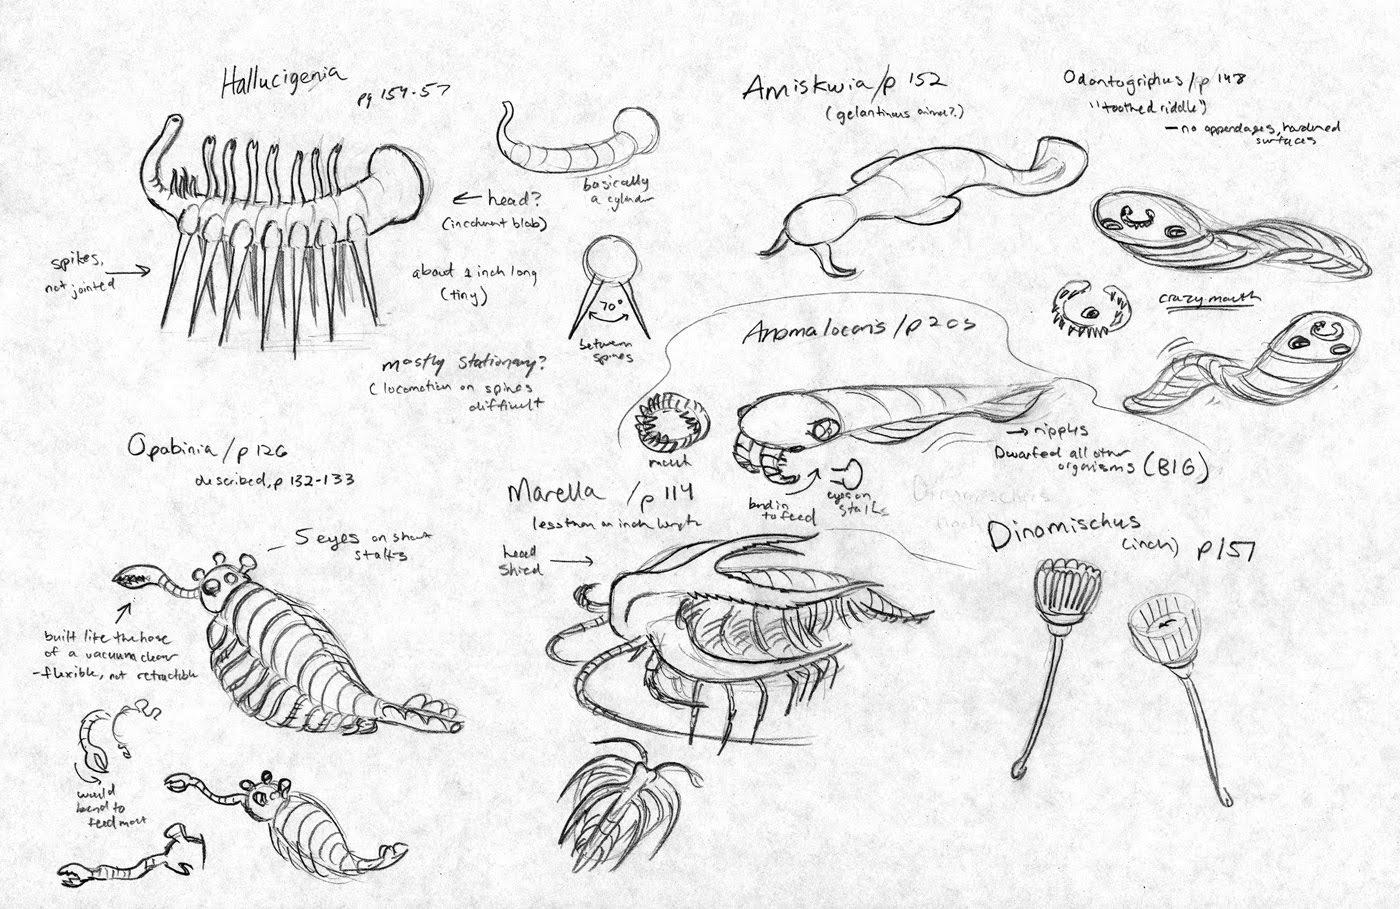 Jinx the Monkey :: Drip!: Hallucigenia of the Cambrian